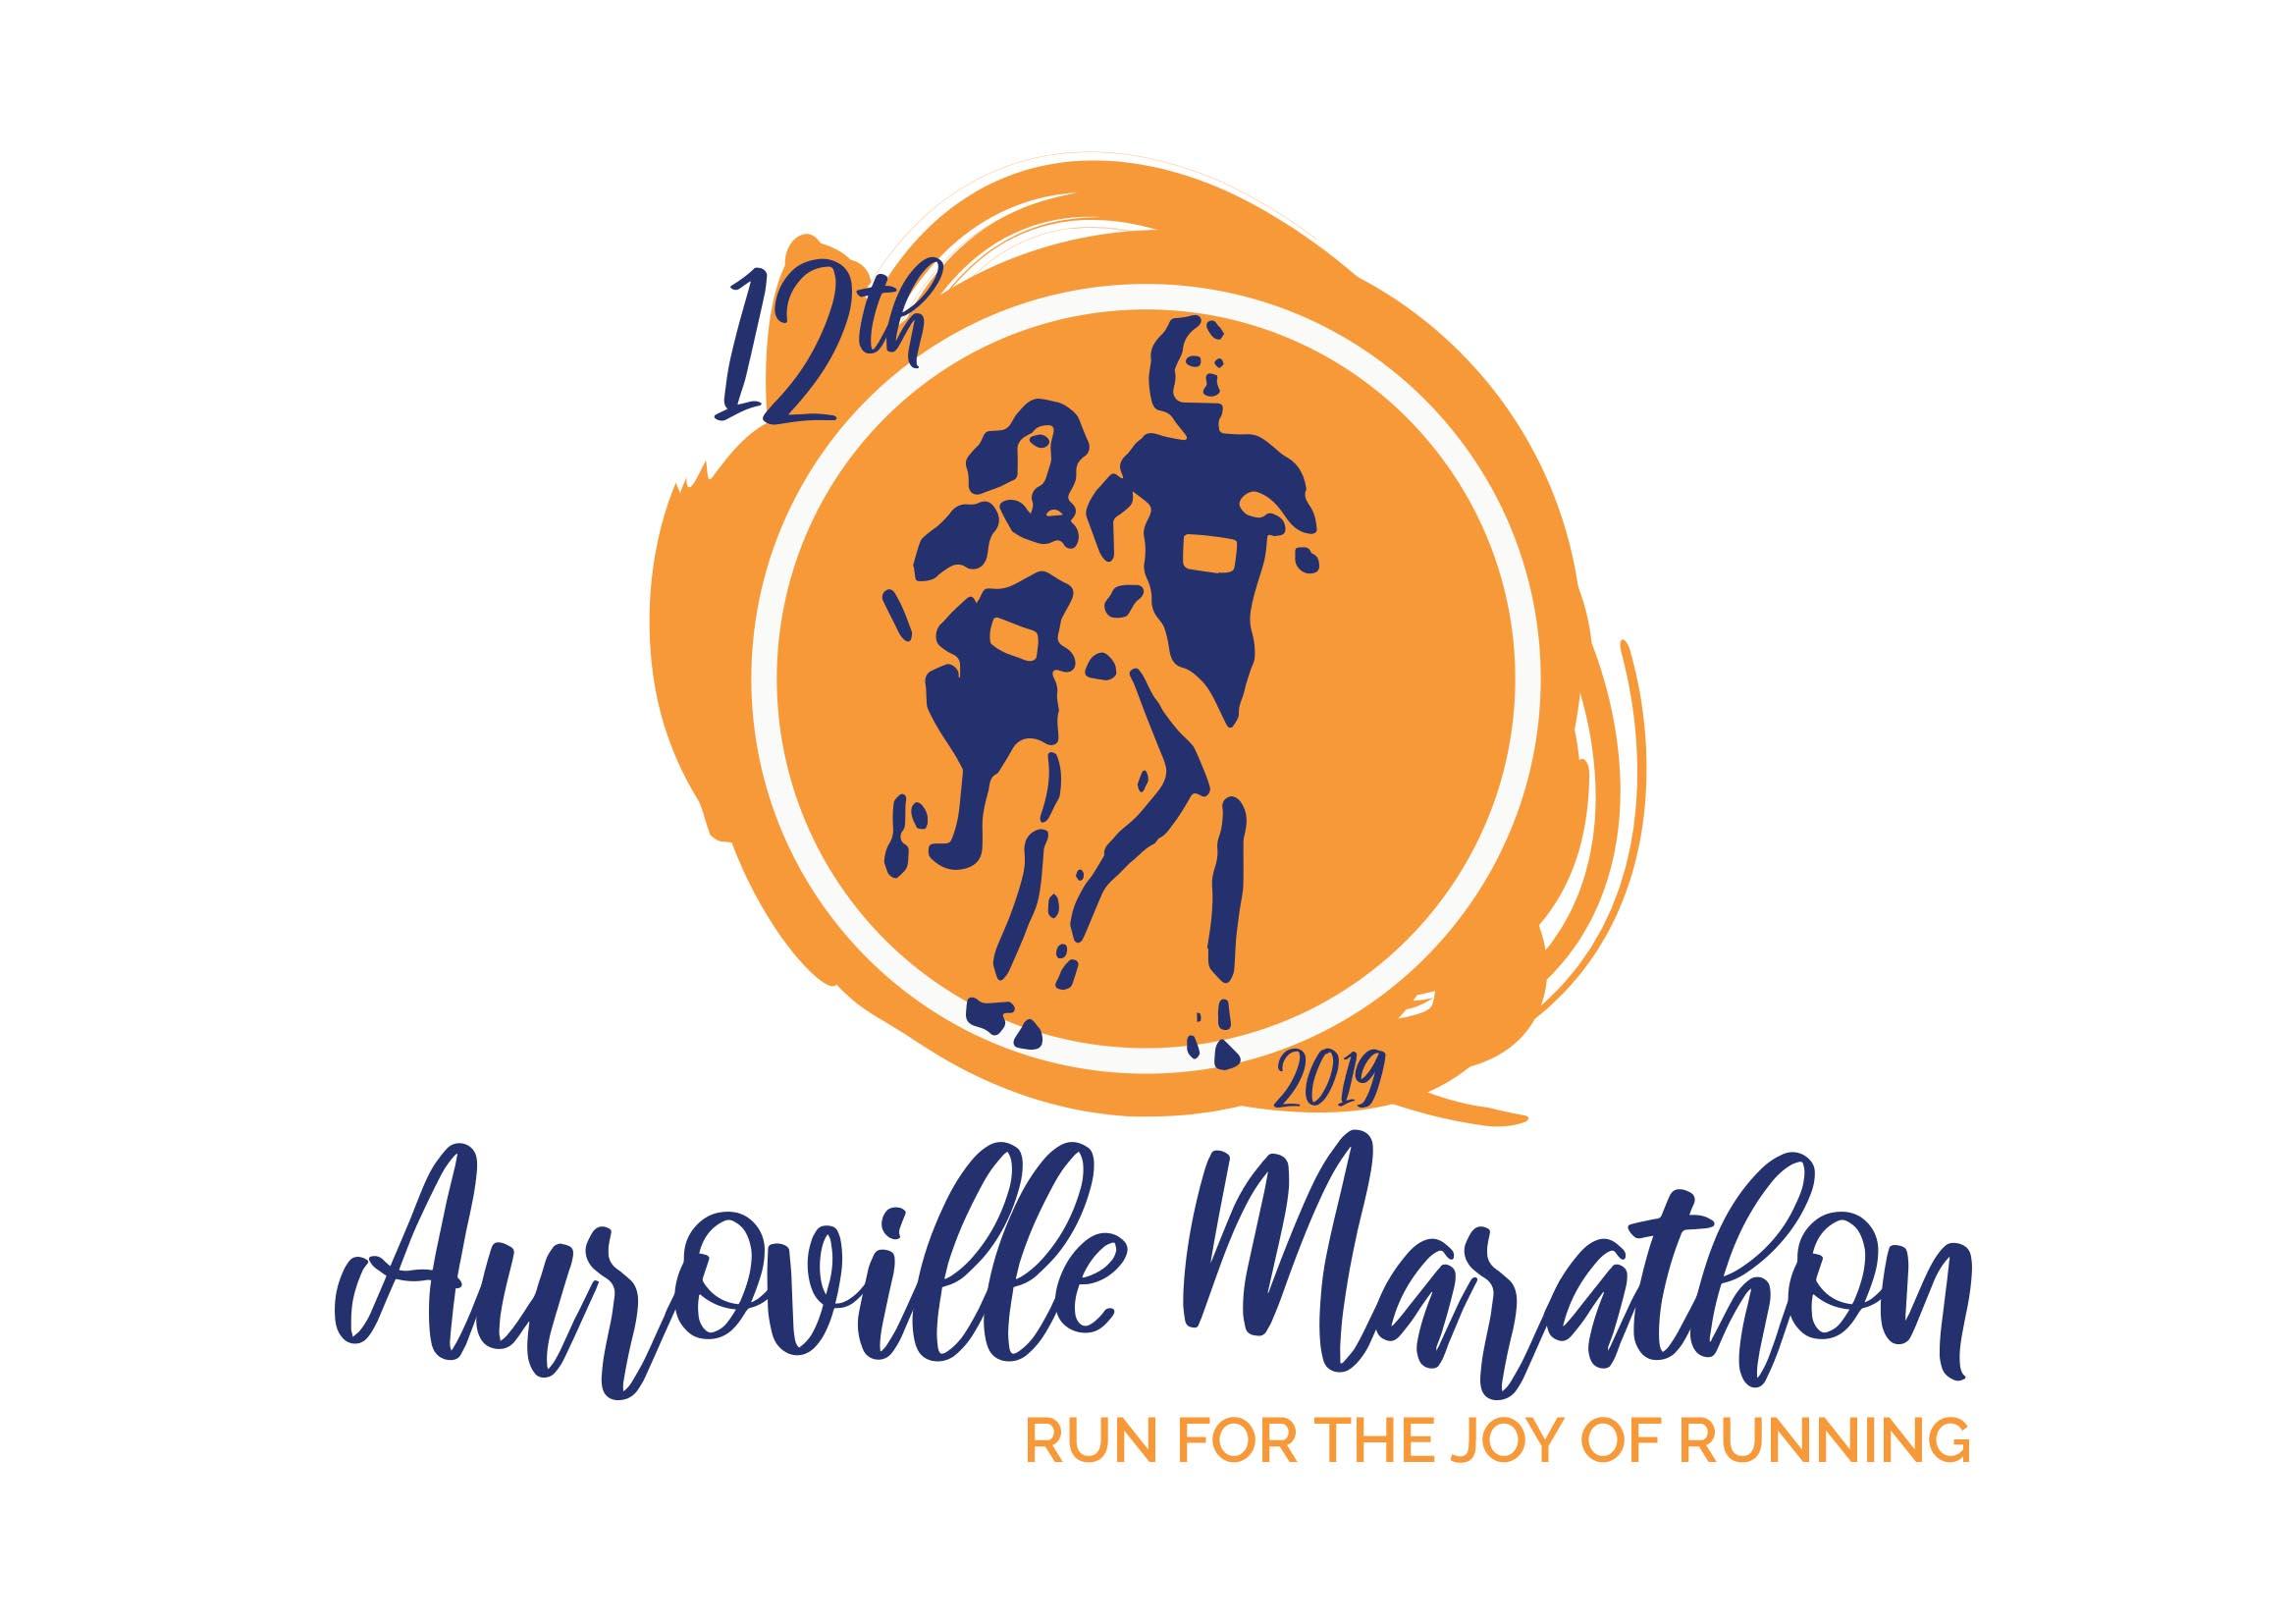 12th marathon